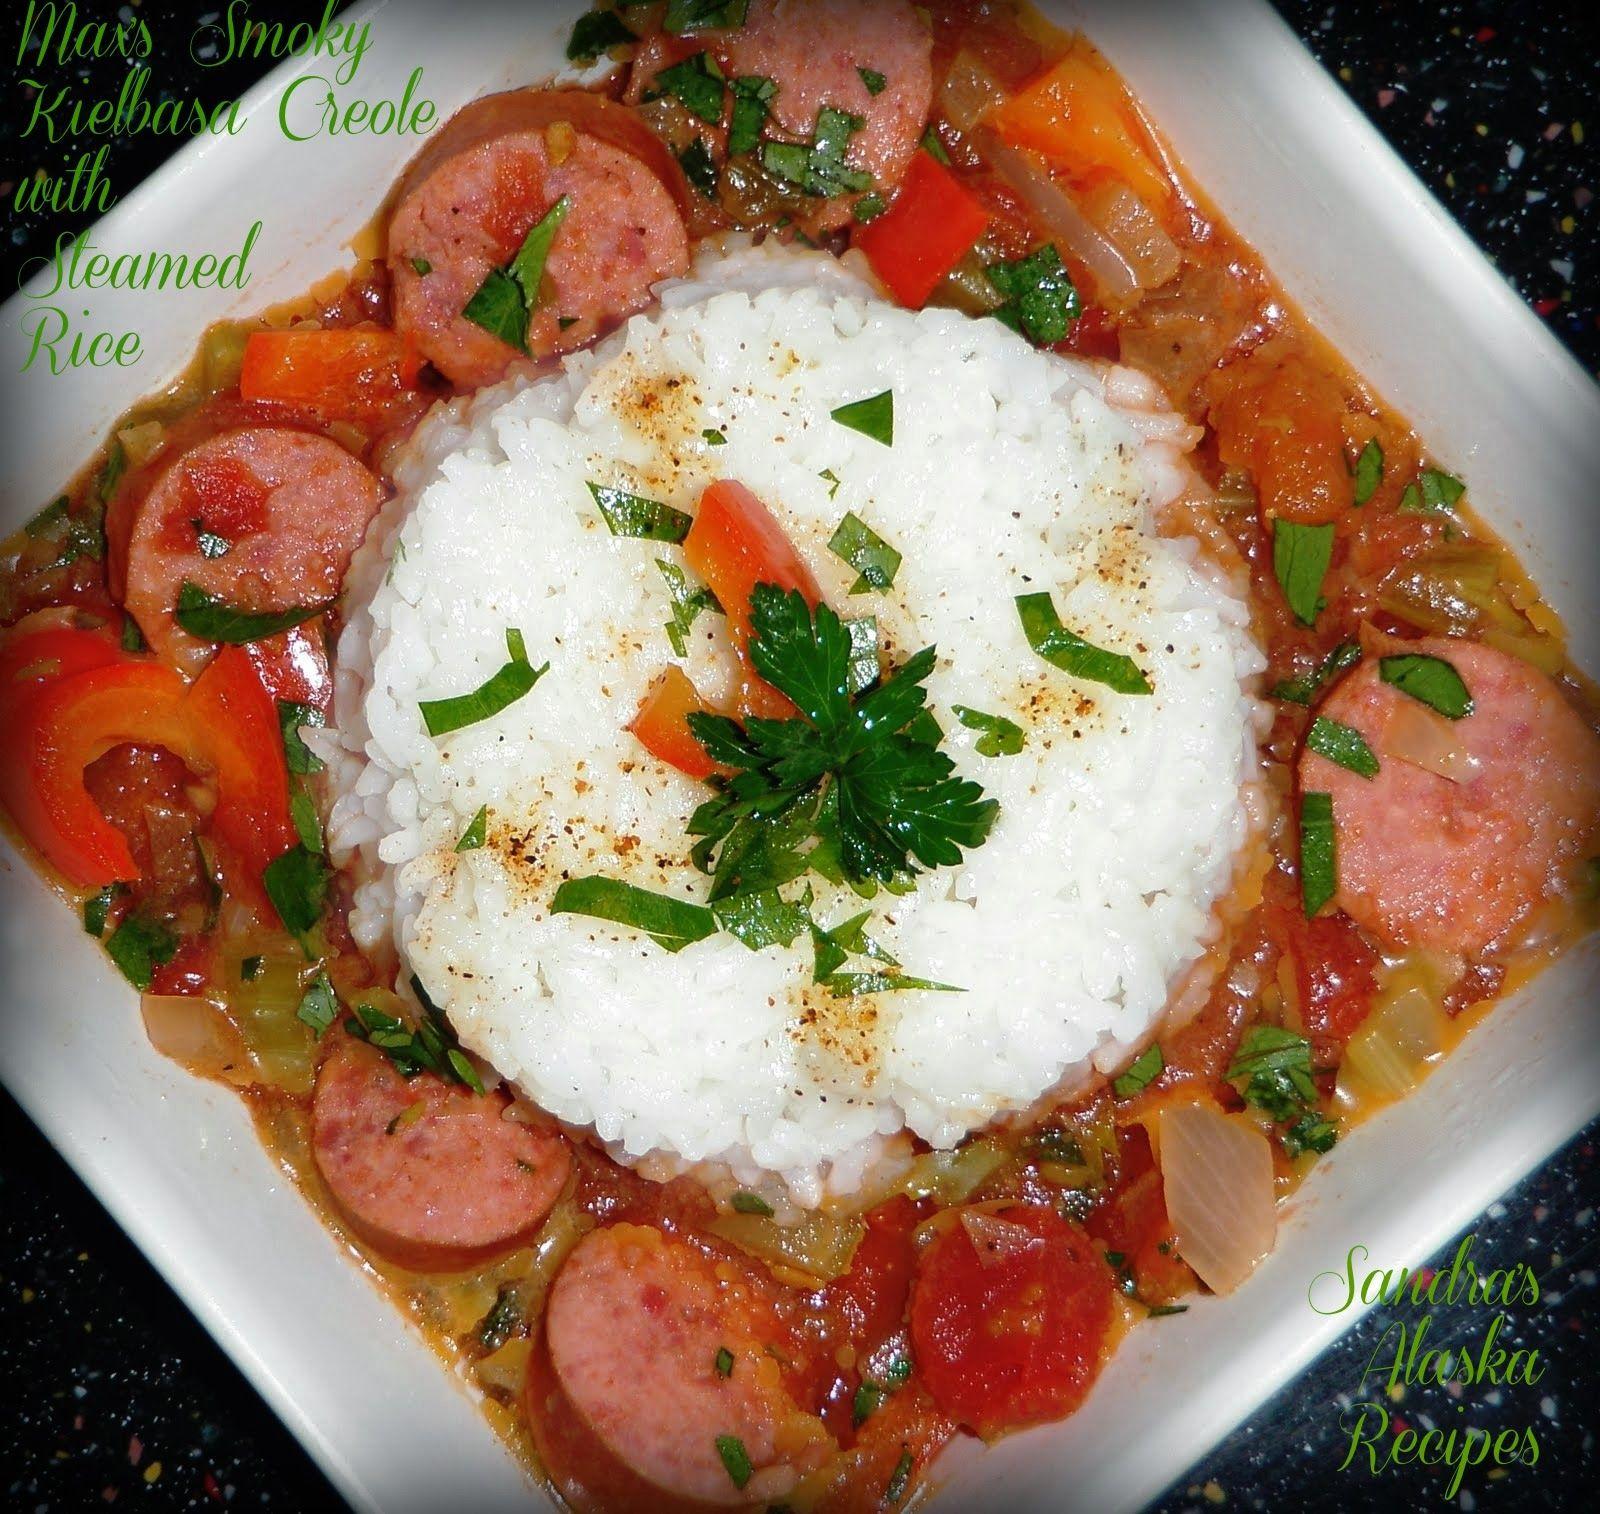 Sandra's Alaska Recipes: MAX'S SMOKY KIELBASA CREOLE with STEAMED RICE (Great w/Seafood too!) - [Click image to view recipe]...